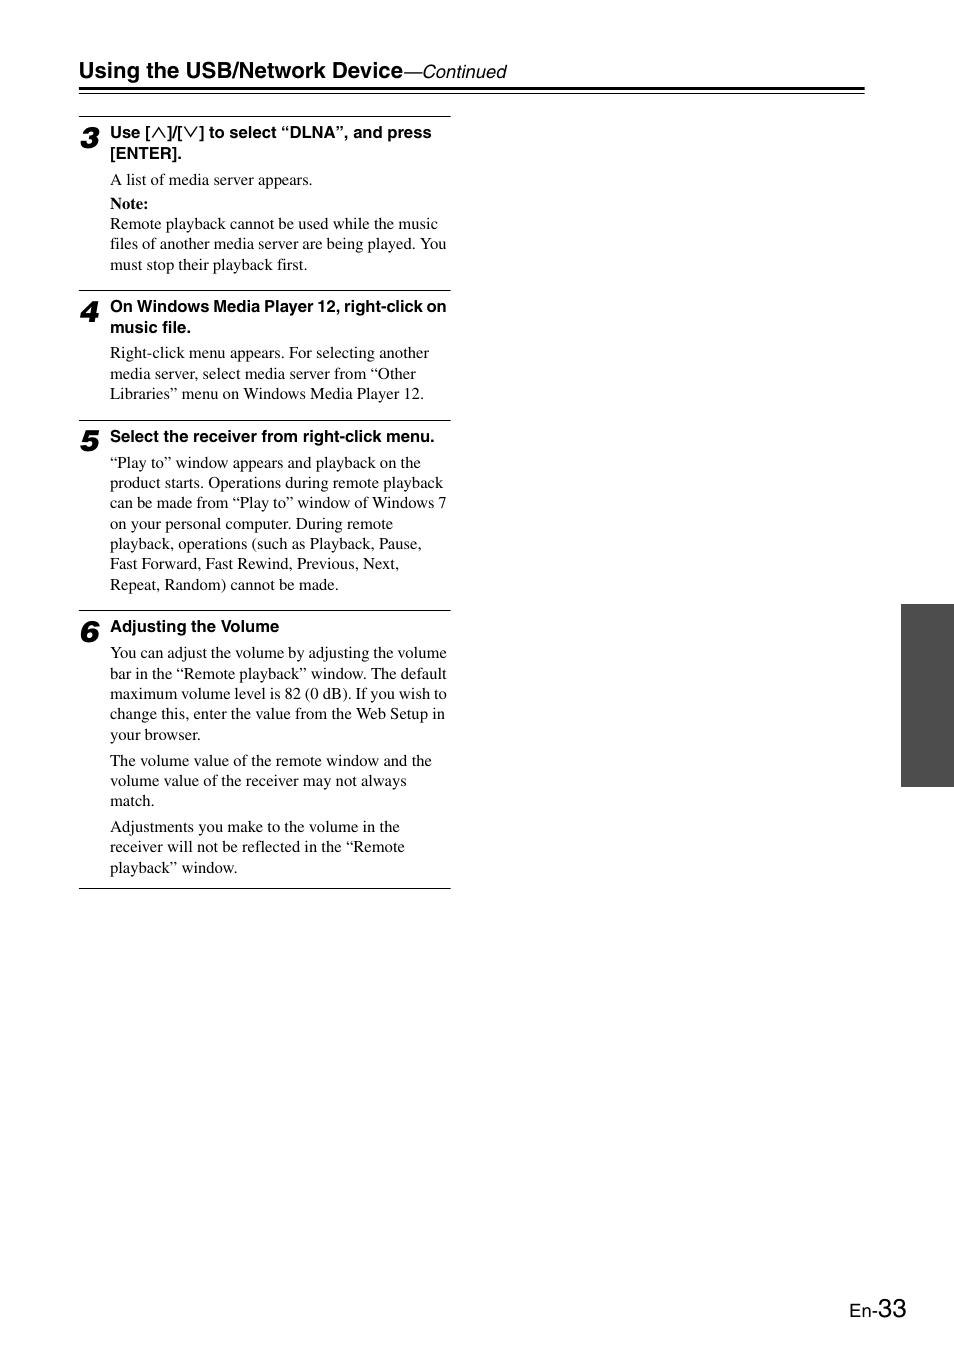 Onkyo Network TX-8050 User Manual | Page 33 / 56 | Original mode